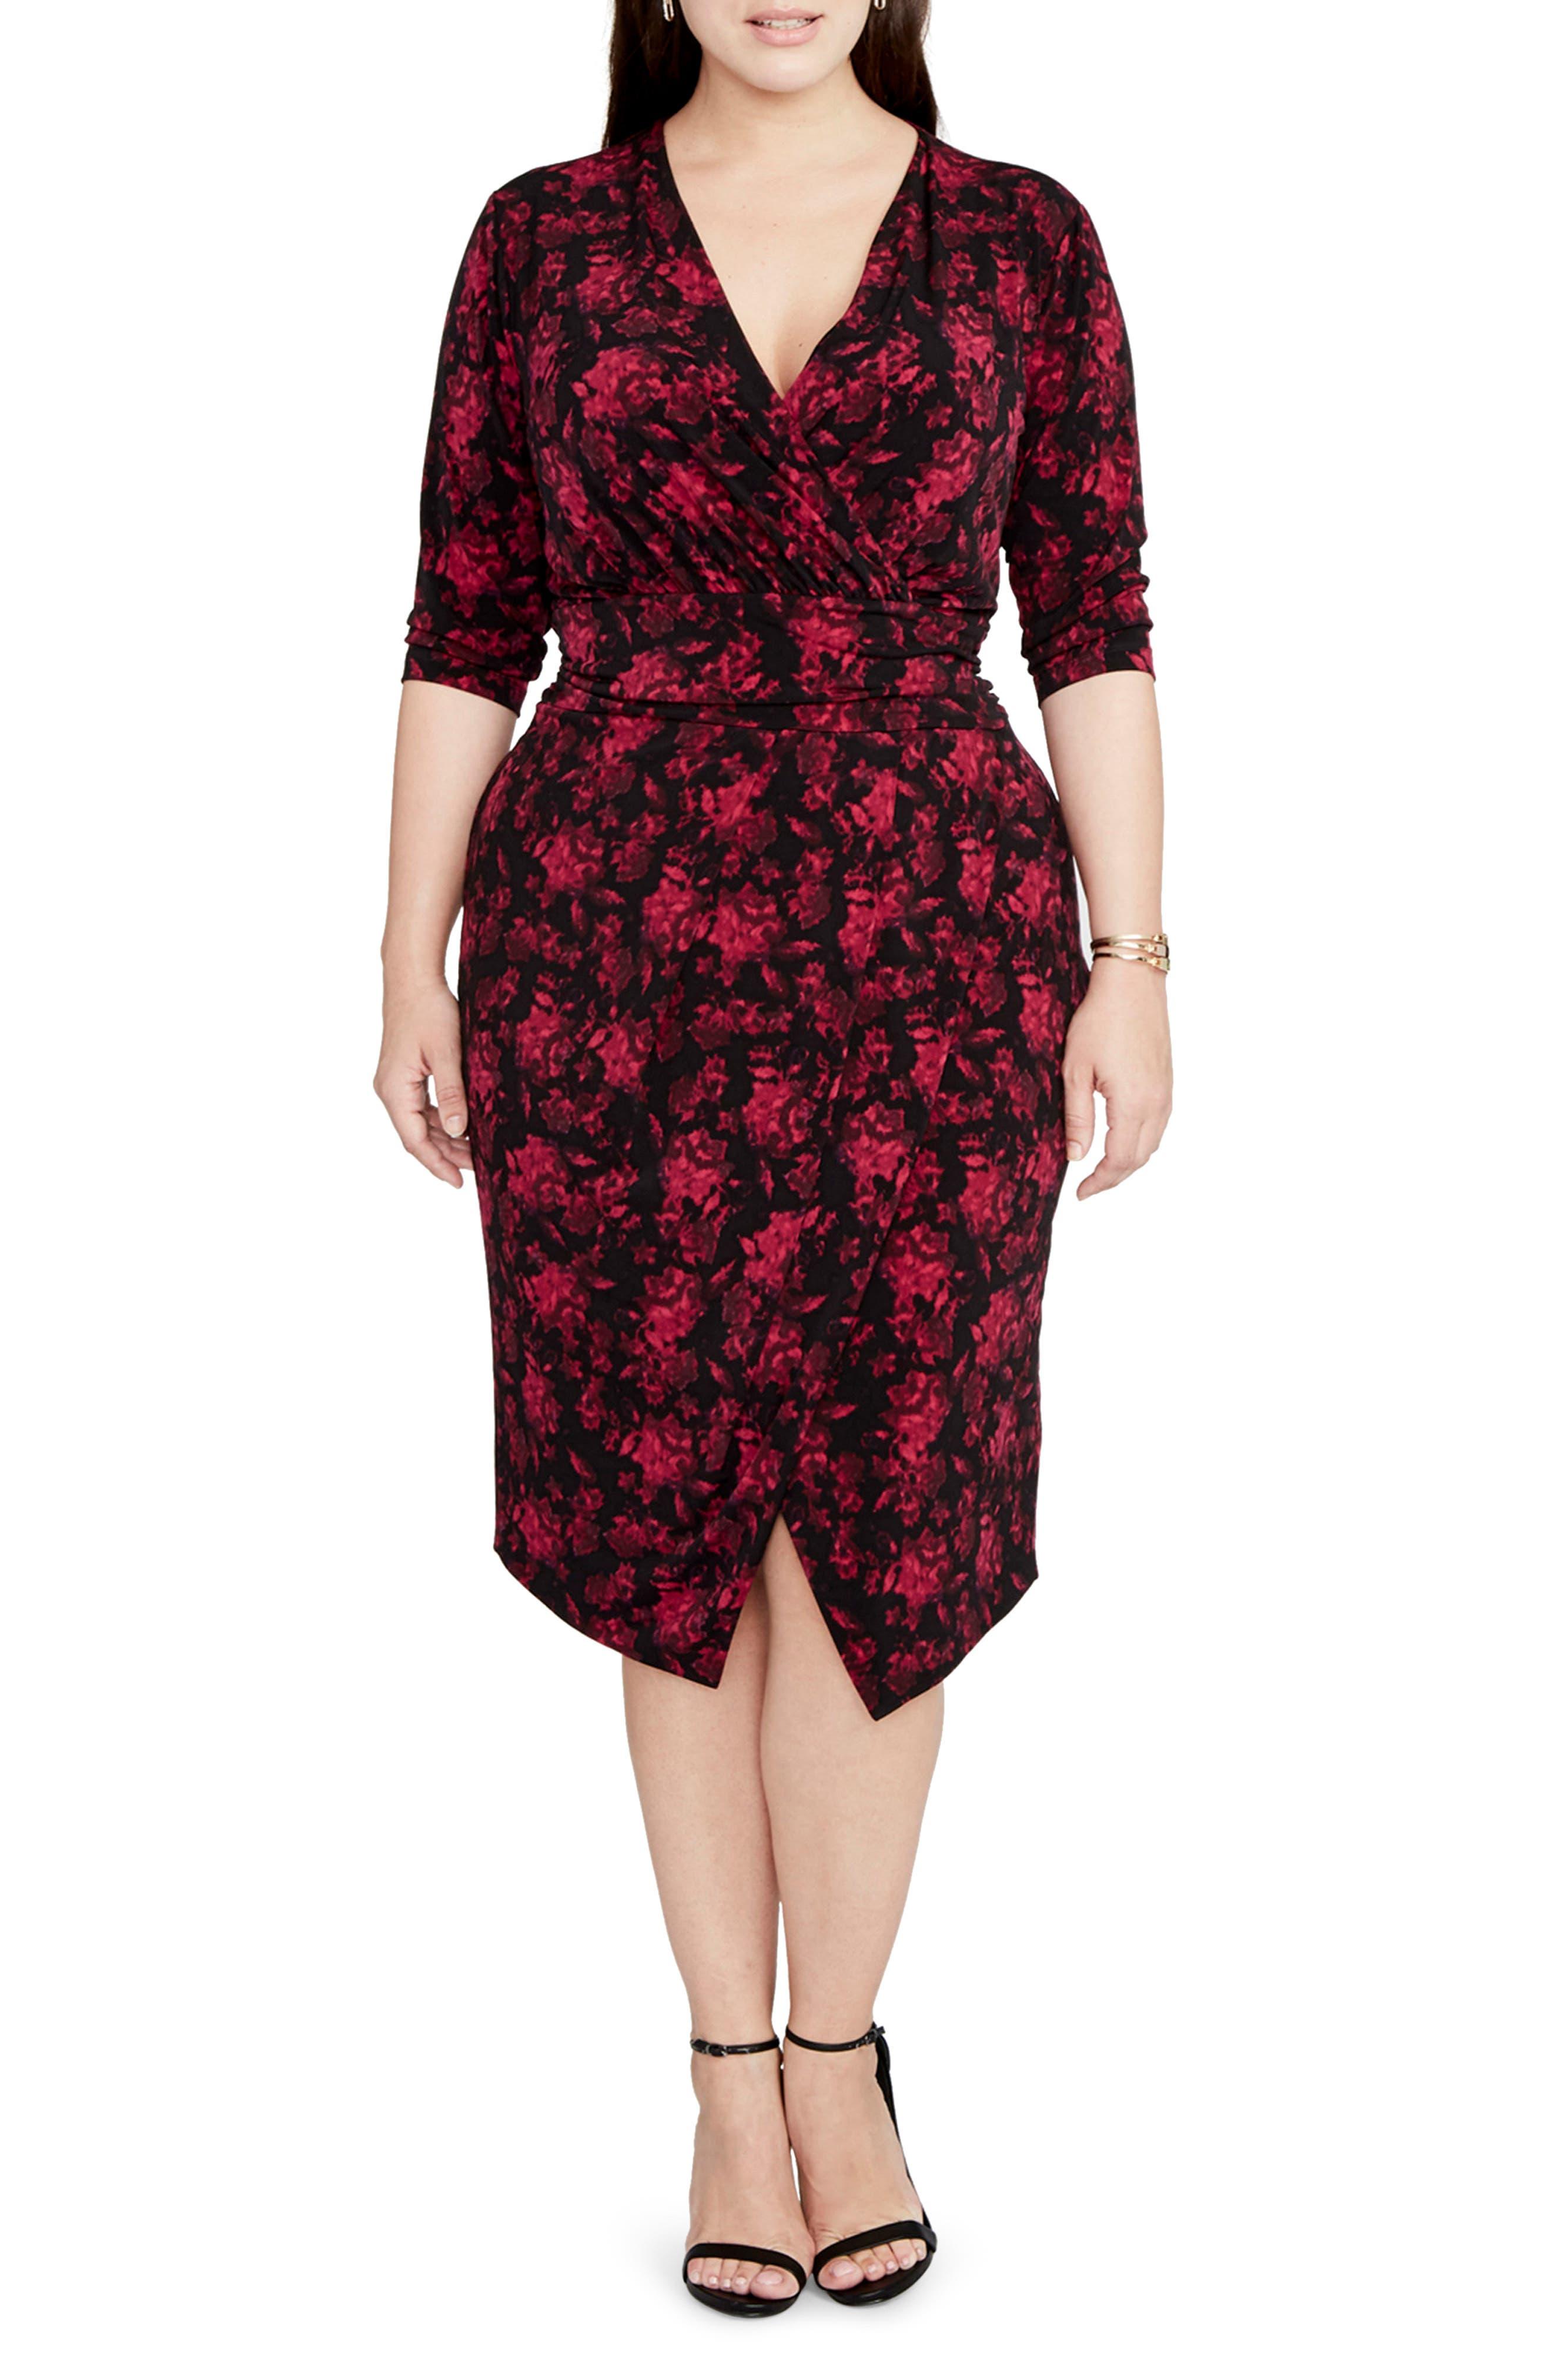 Alternate Image 1 Selected - RACHEL Rachel Roy Print Wrap Front Jersey Dress (Plus Size)